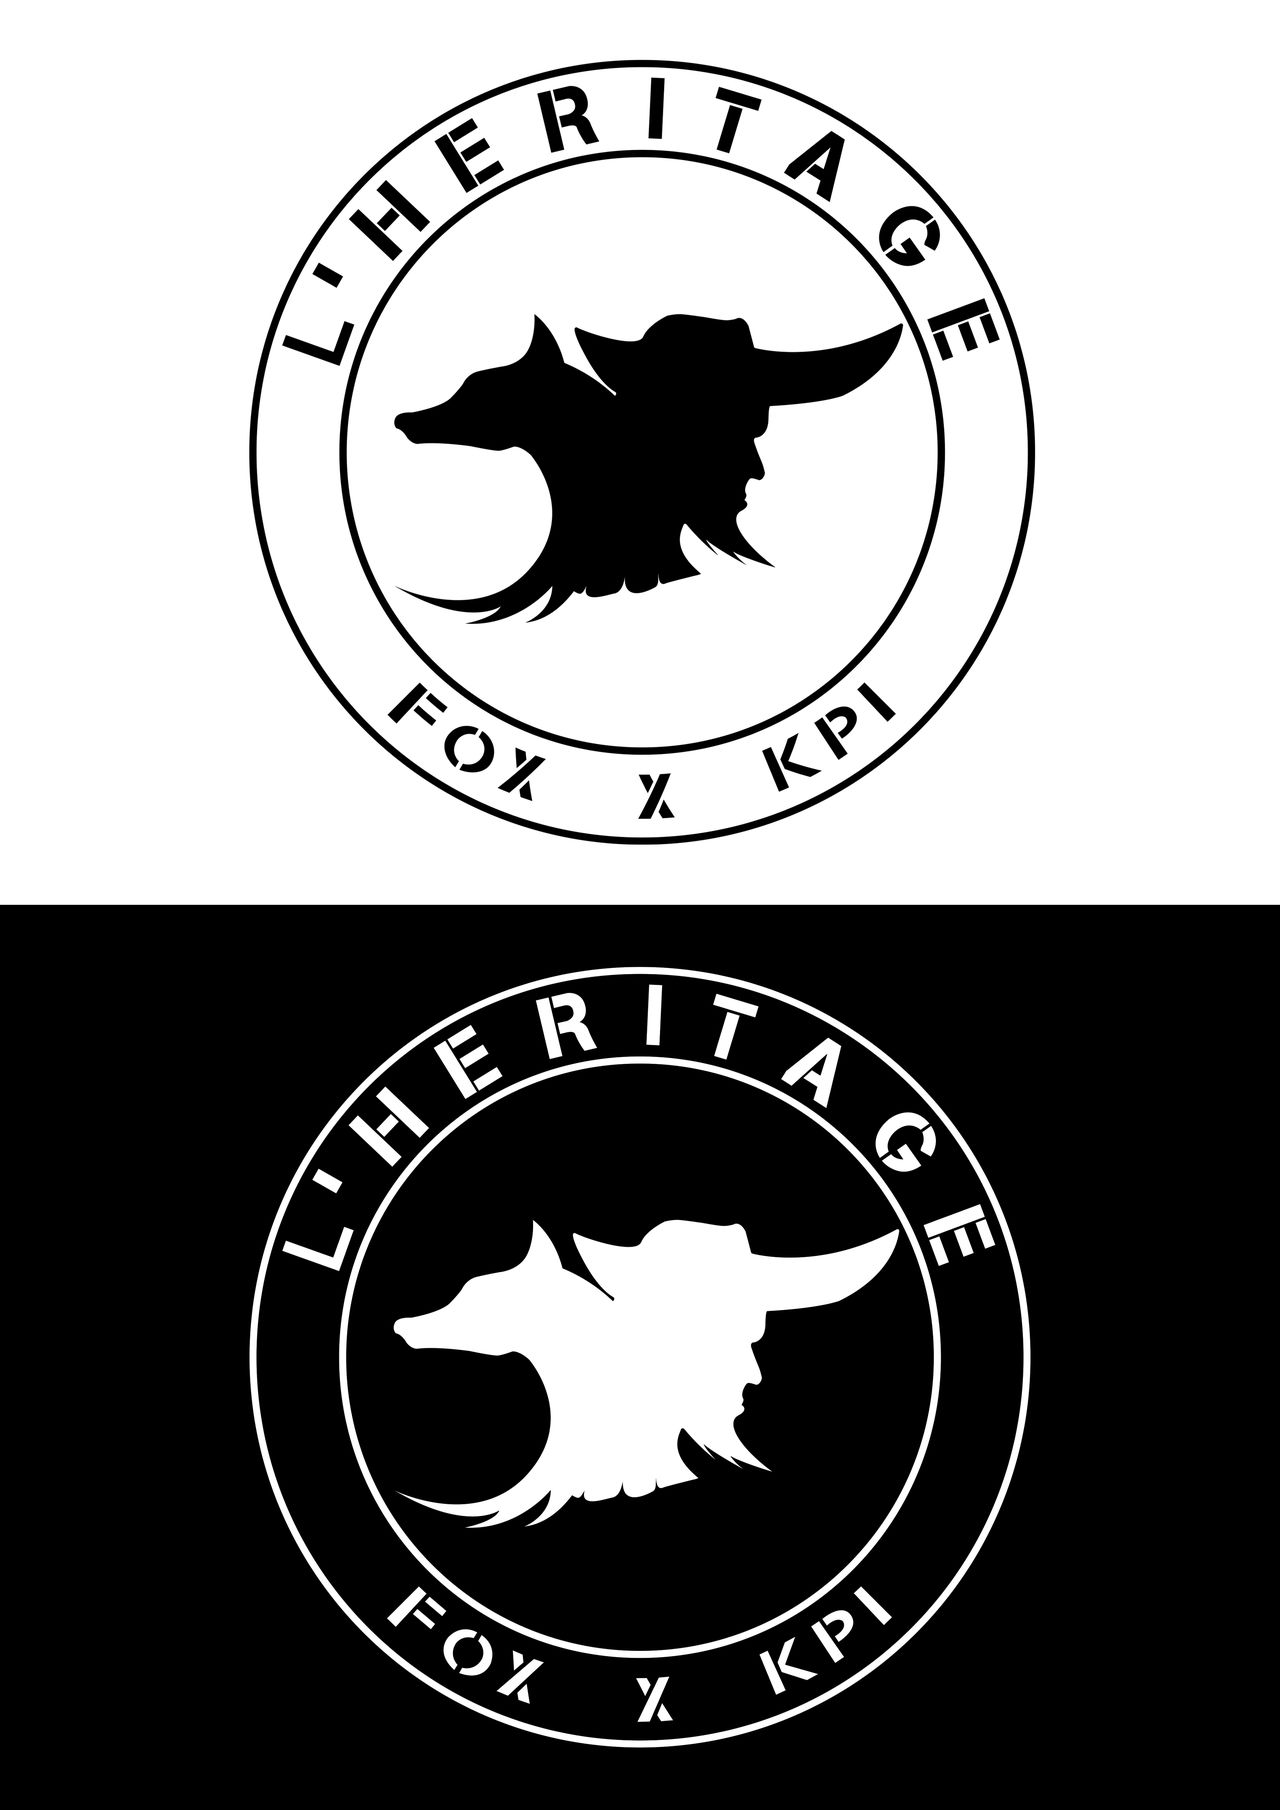 Logo de l'héritage